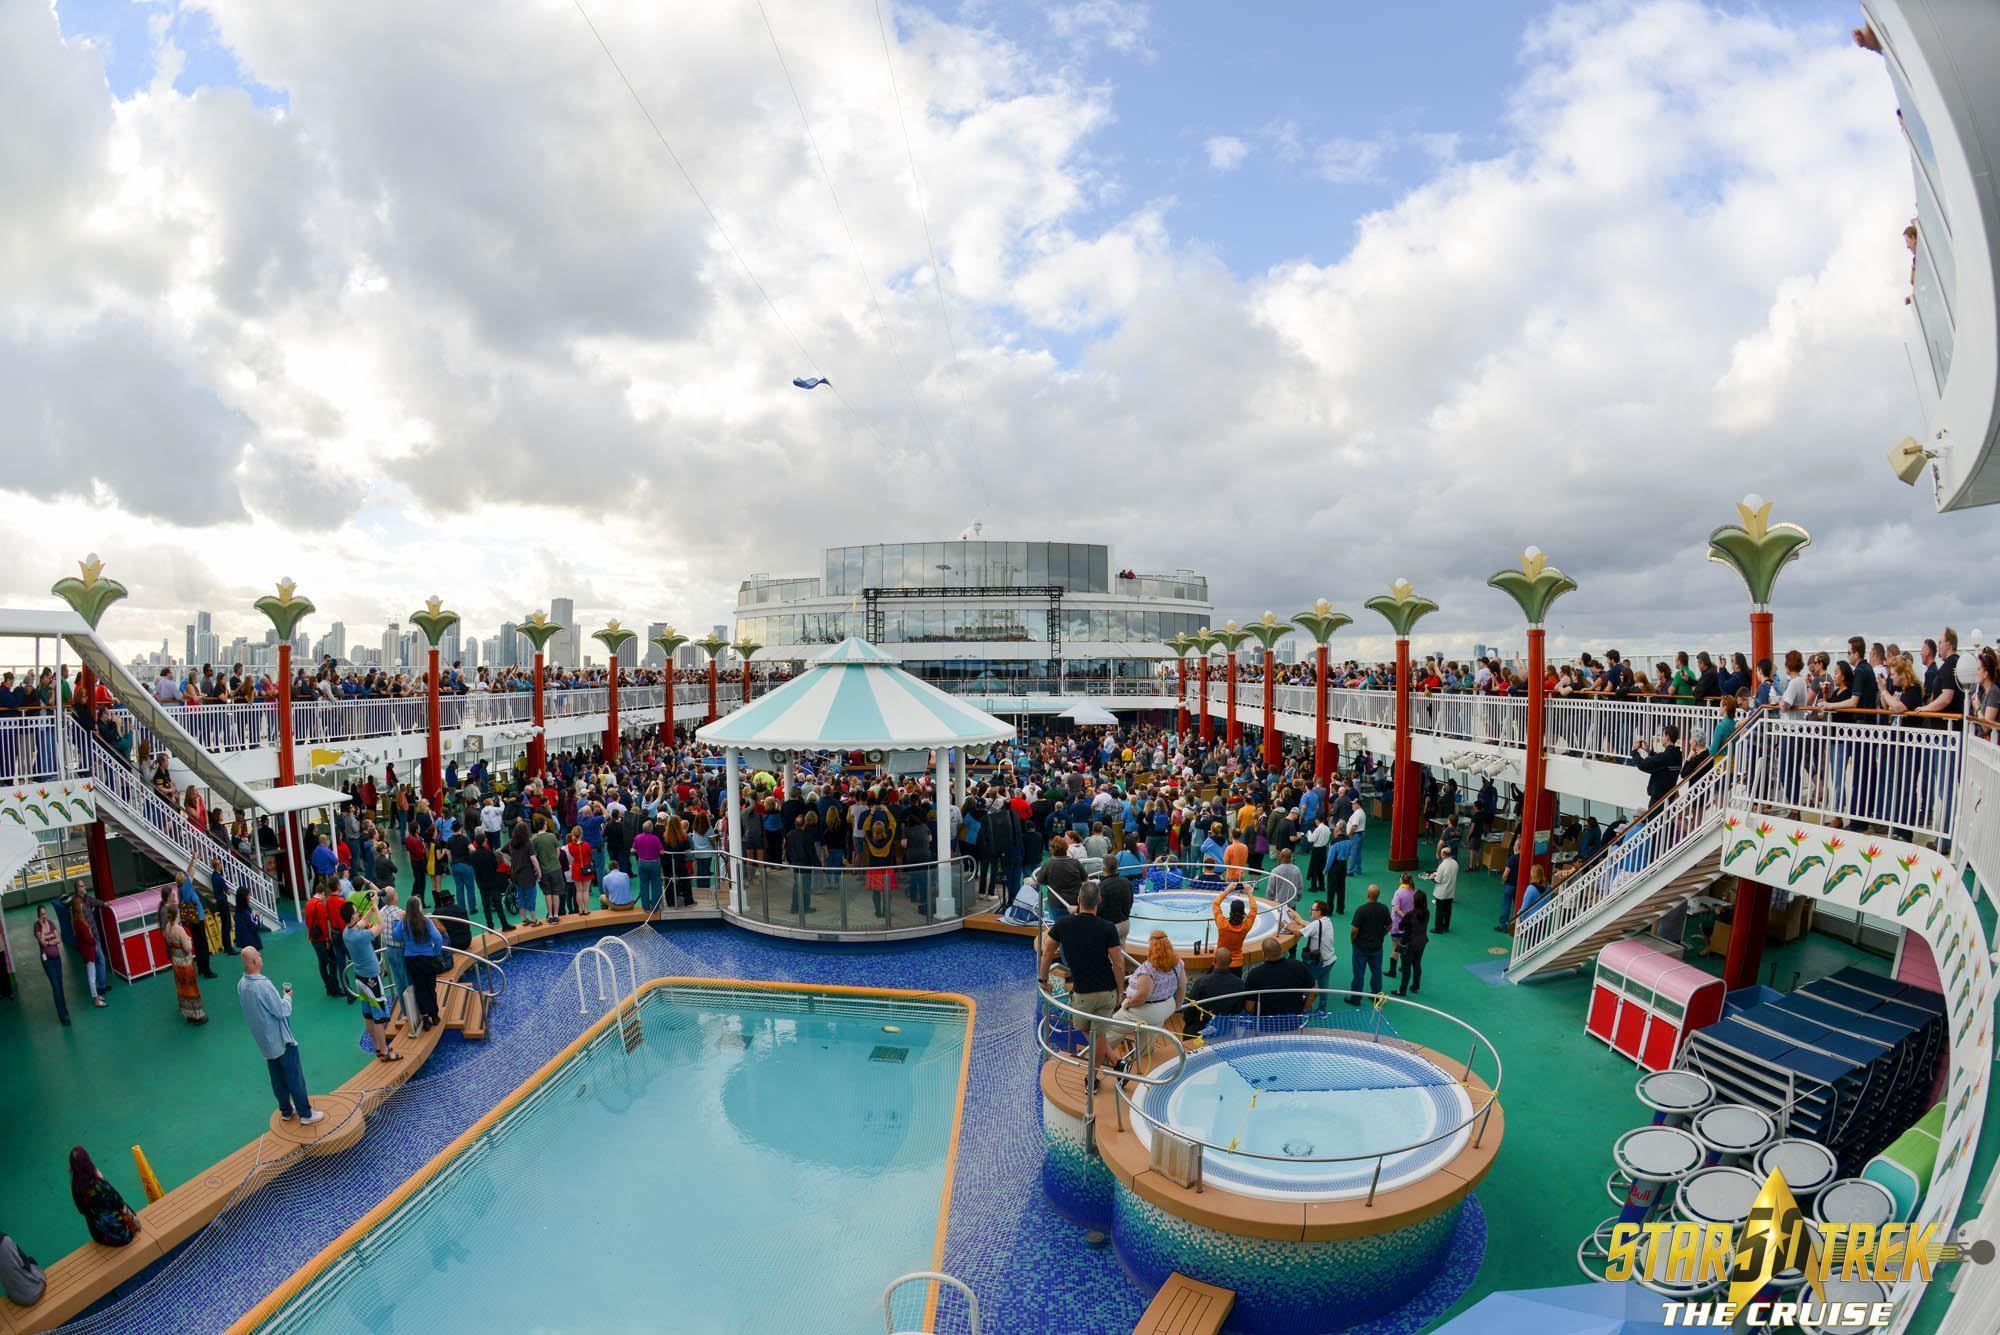 Norwegian Jade To Host Star Trek Cruise in 2019